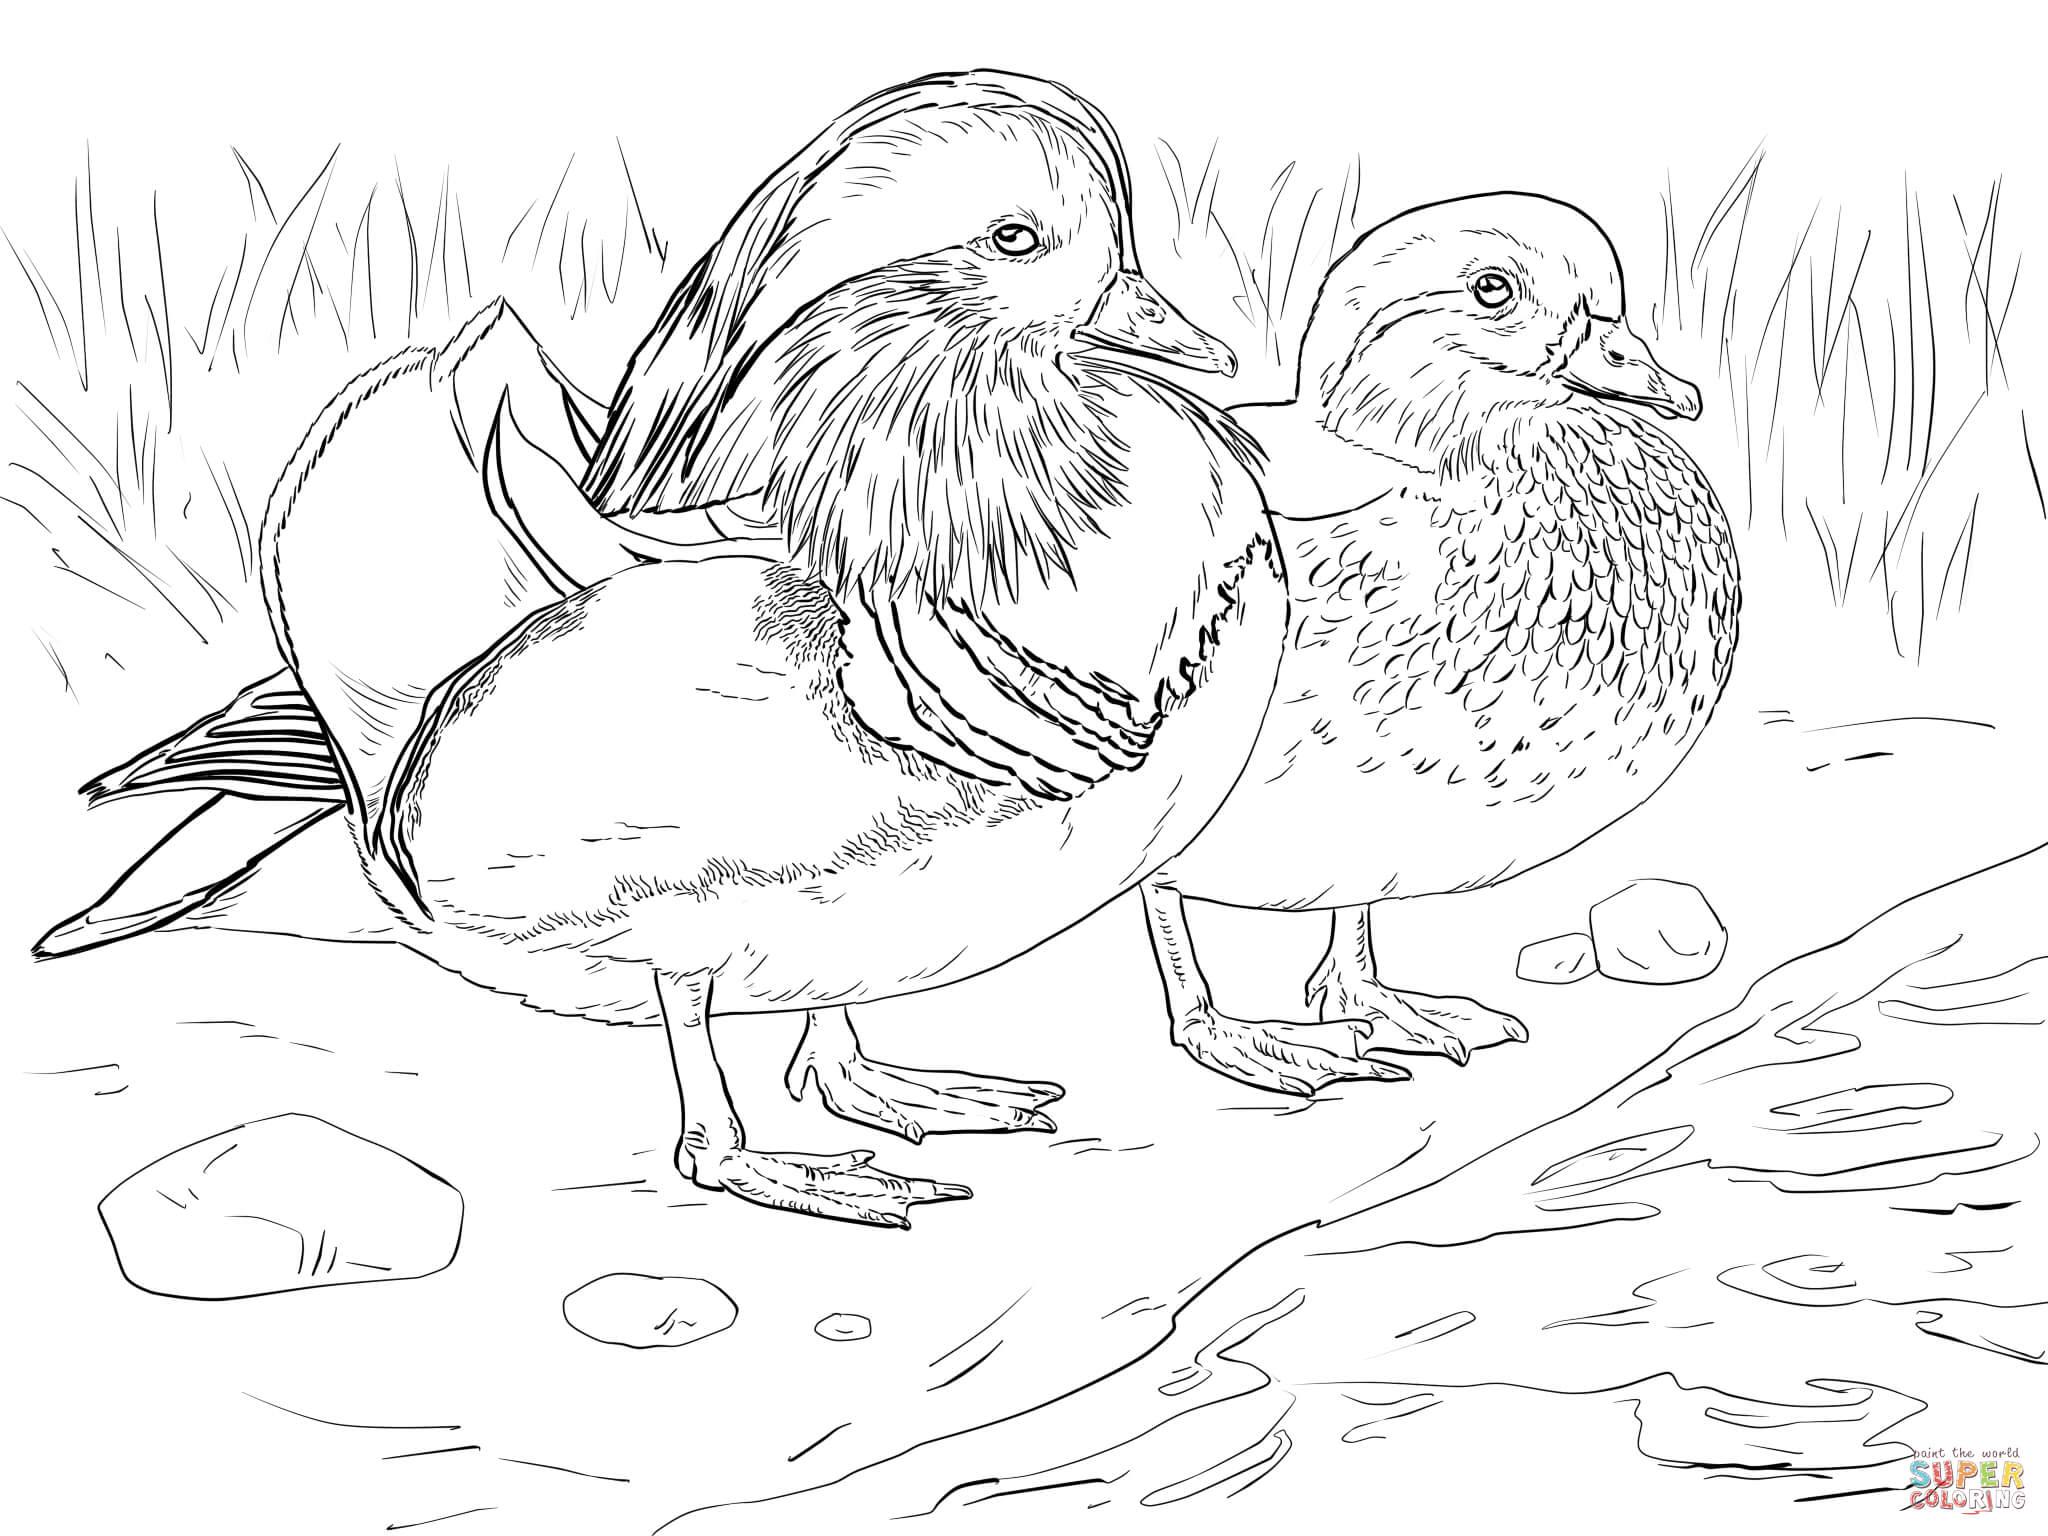 Wood Duck coloring #17, Download drawings